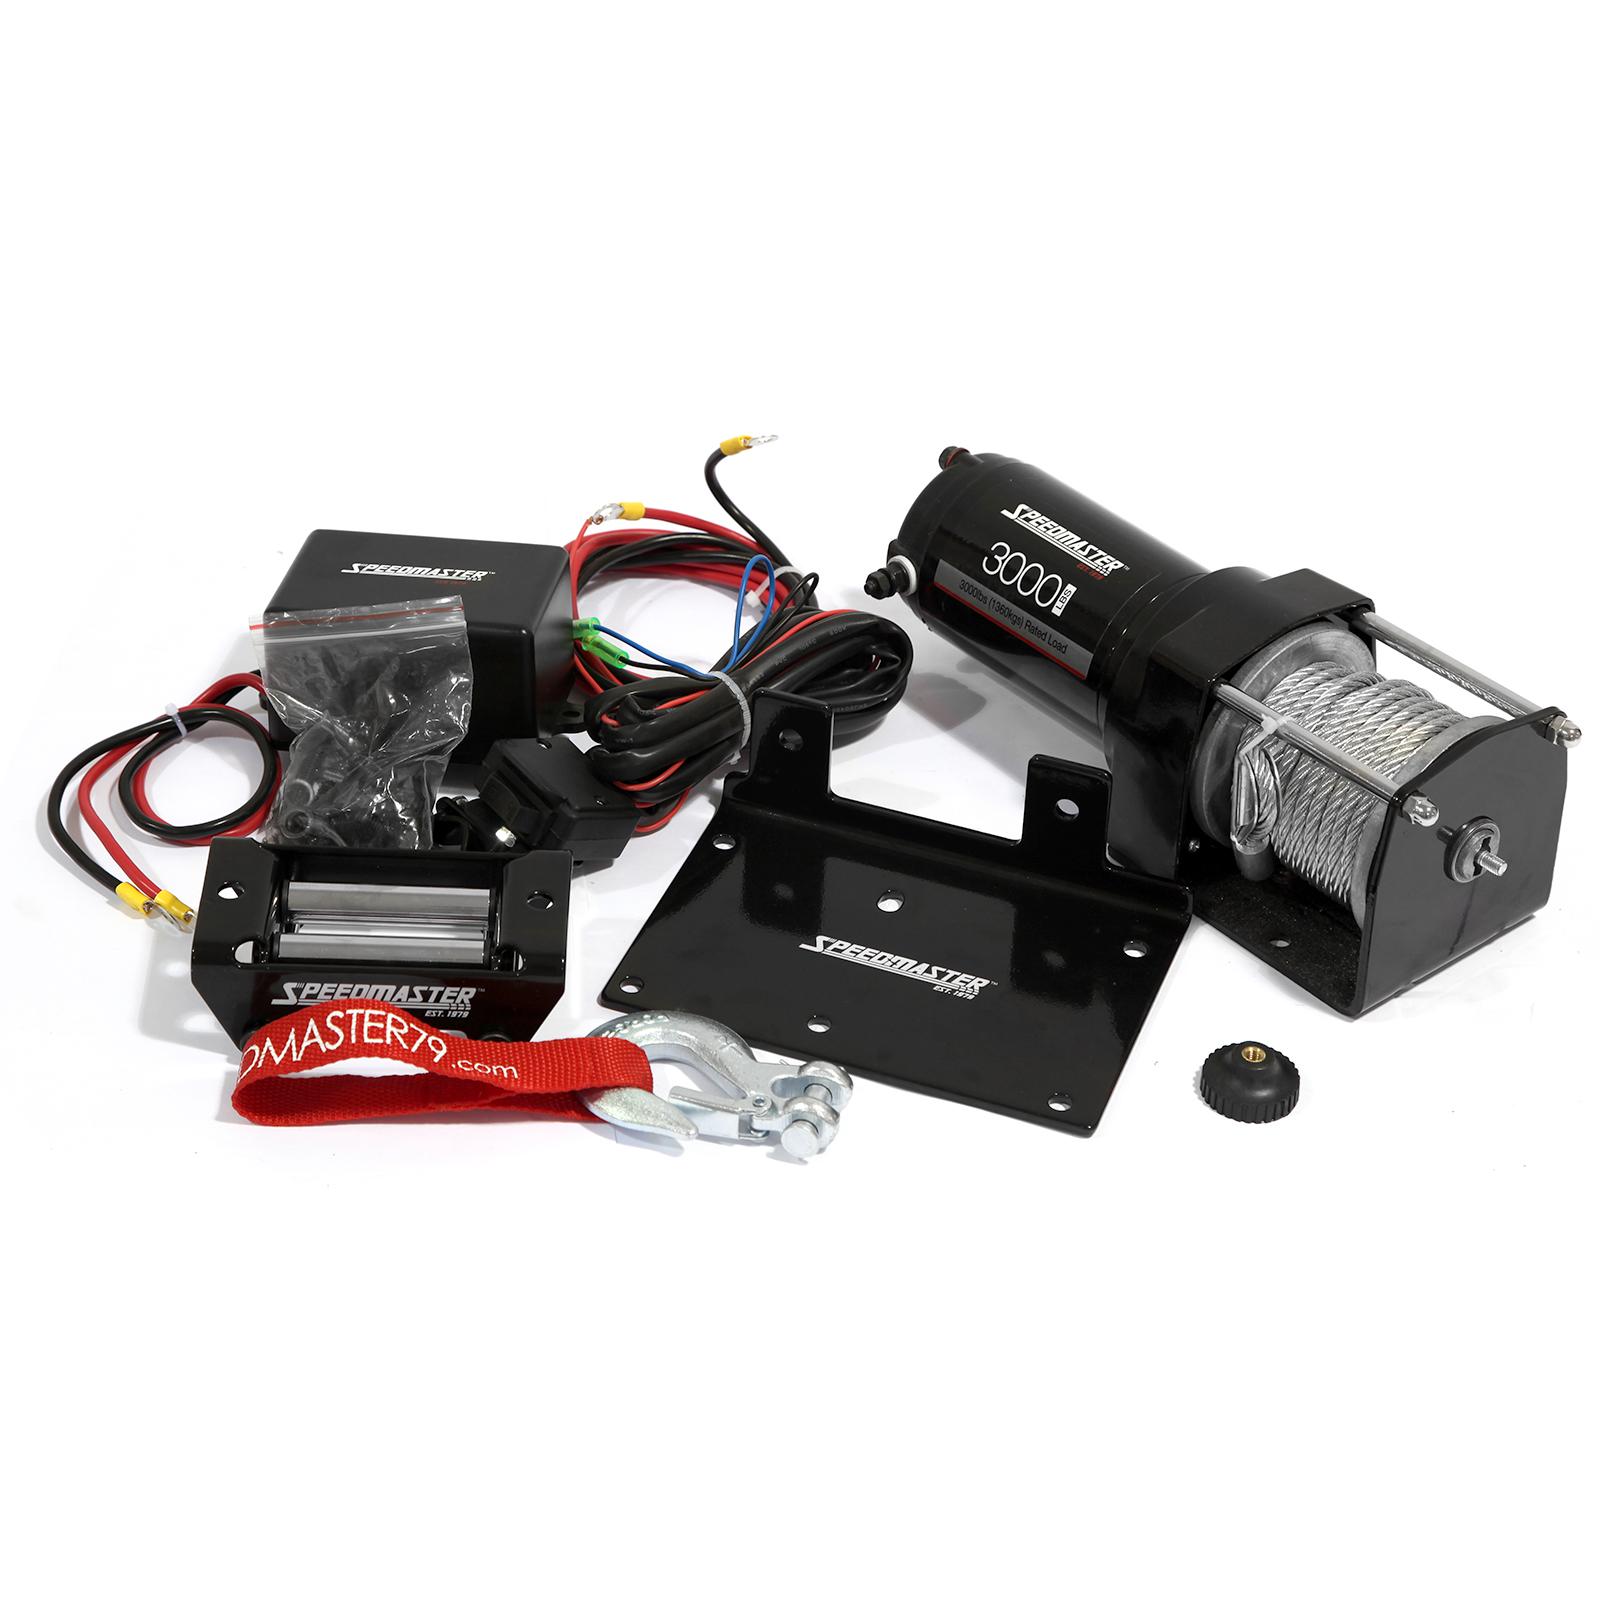 3000lbs / 1360kgs 12V Electric ATV Winch Kit w/ Remote Switch